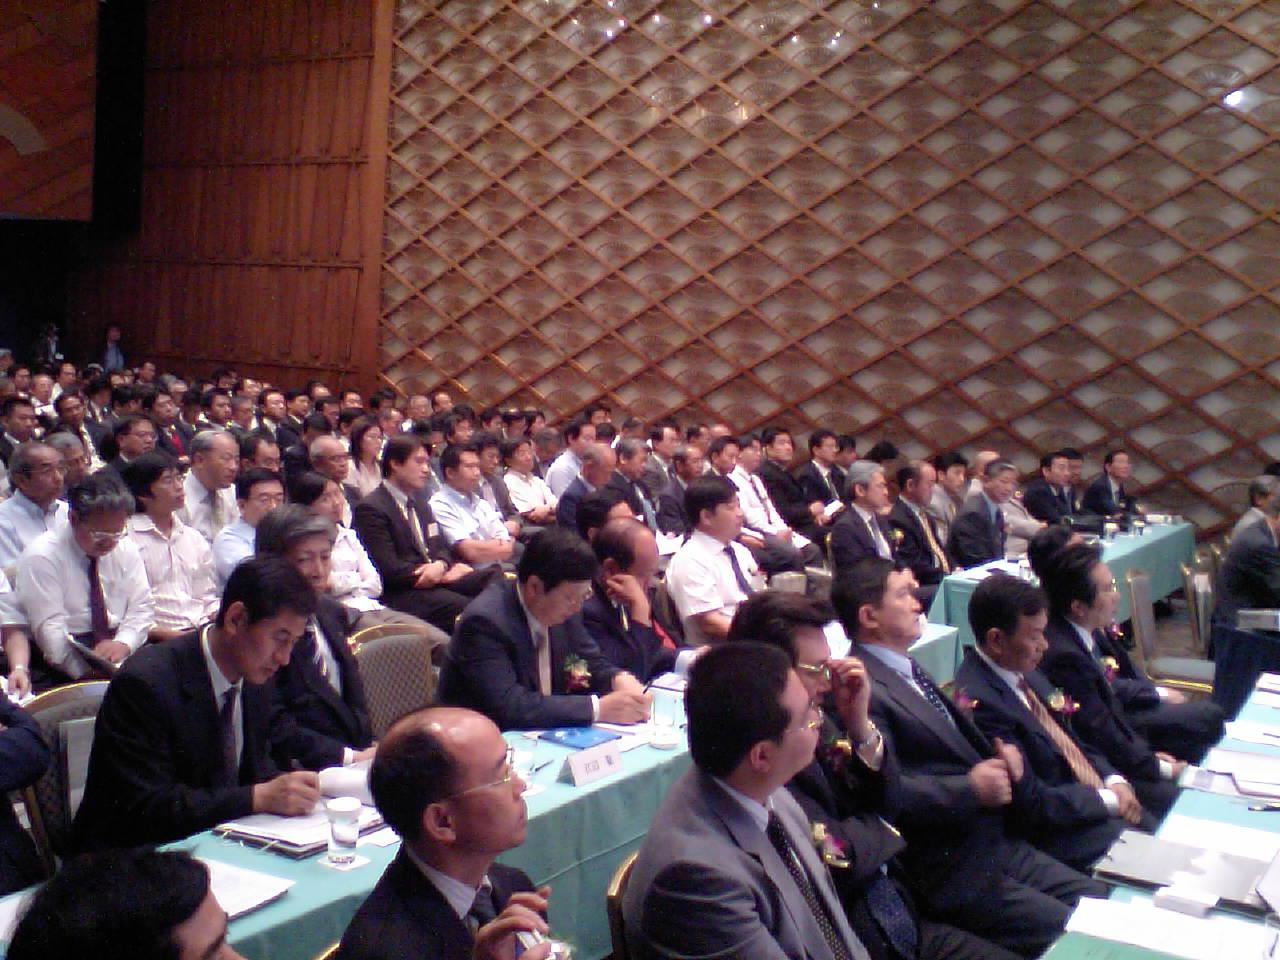 中国山東投資プロジェクト説明会会場の写真_d0027795_16504566.jpg